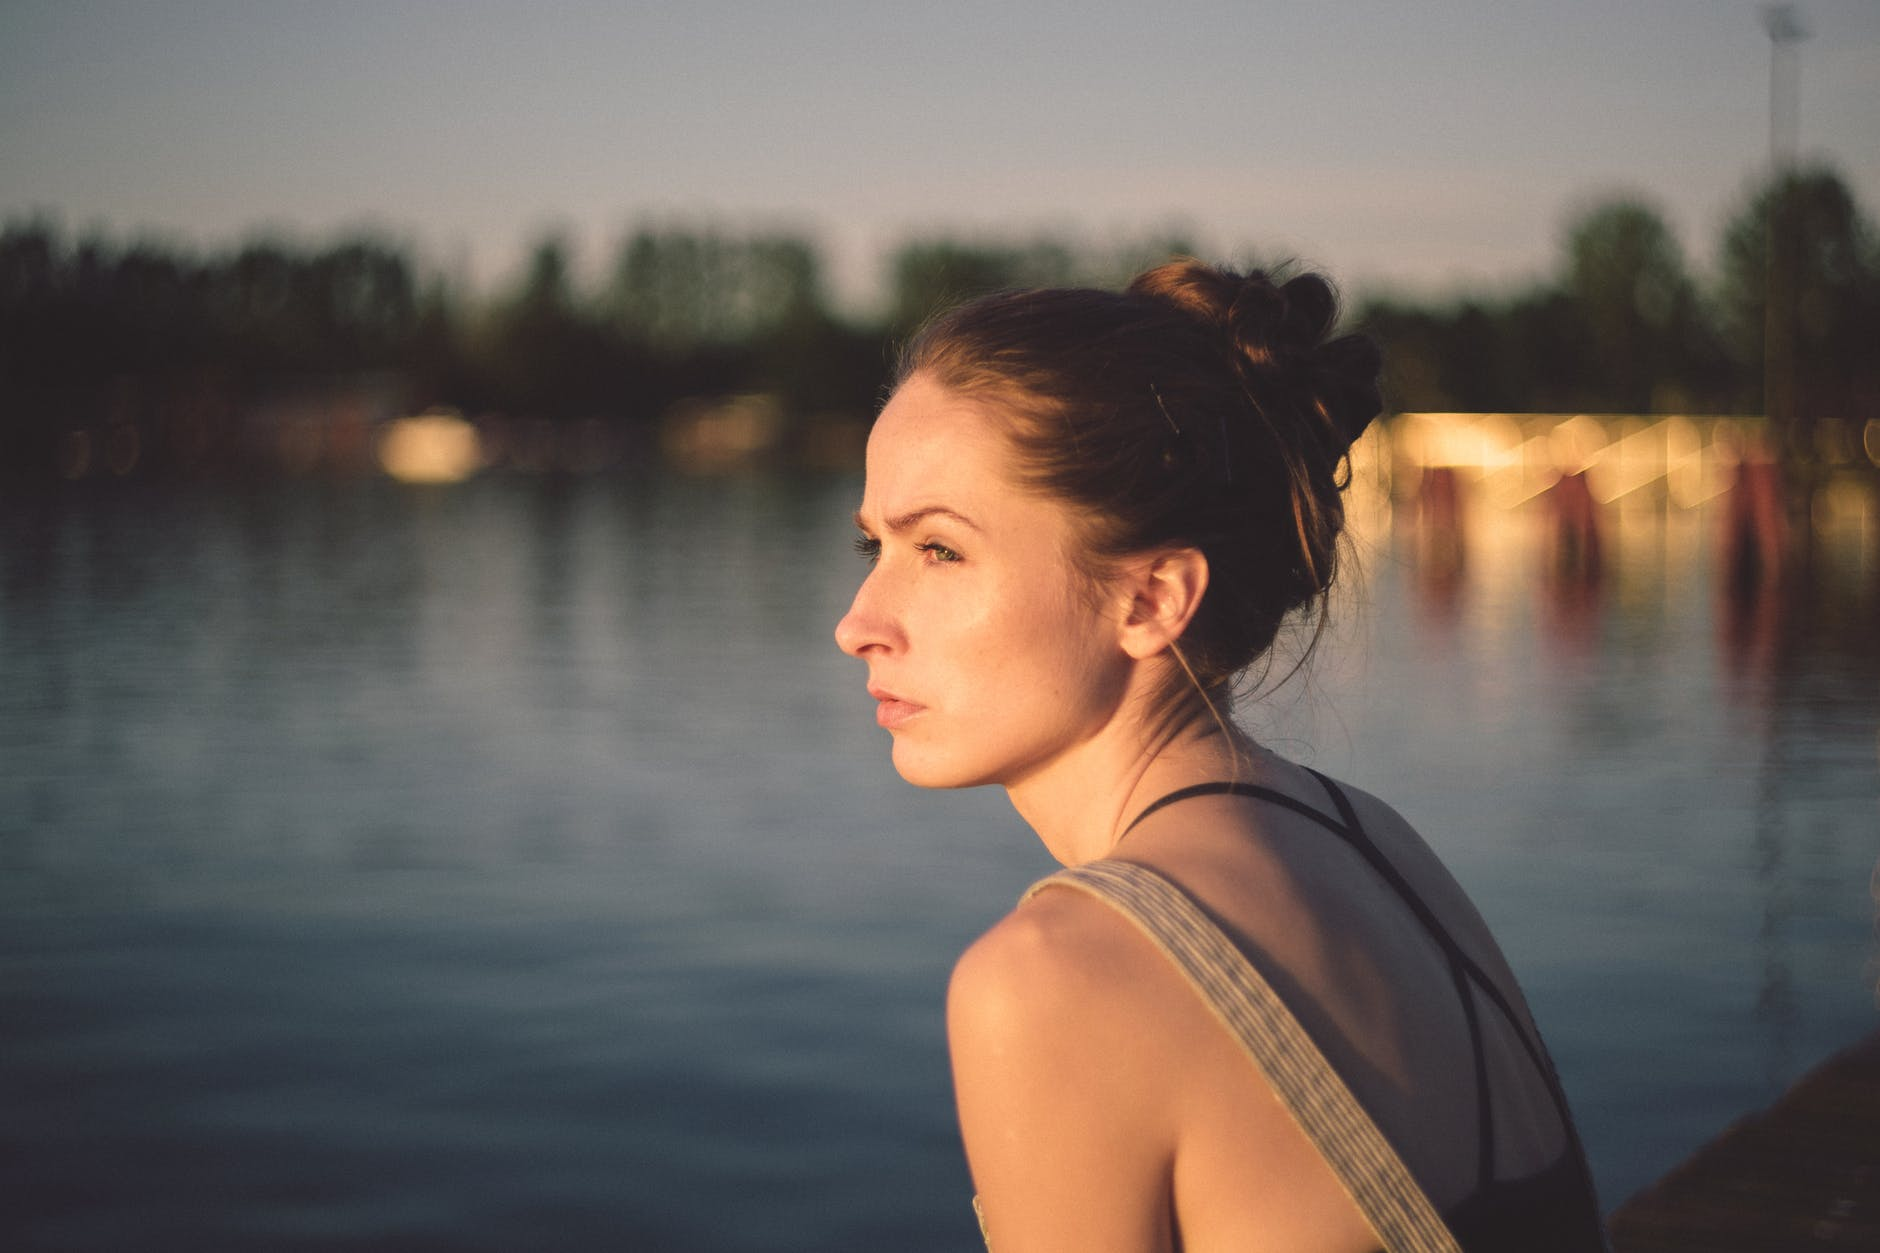 WOMAN WATCH THE SEA